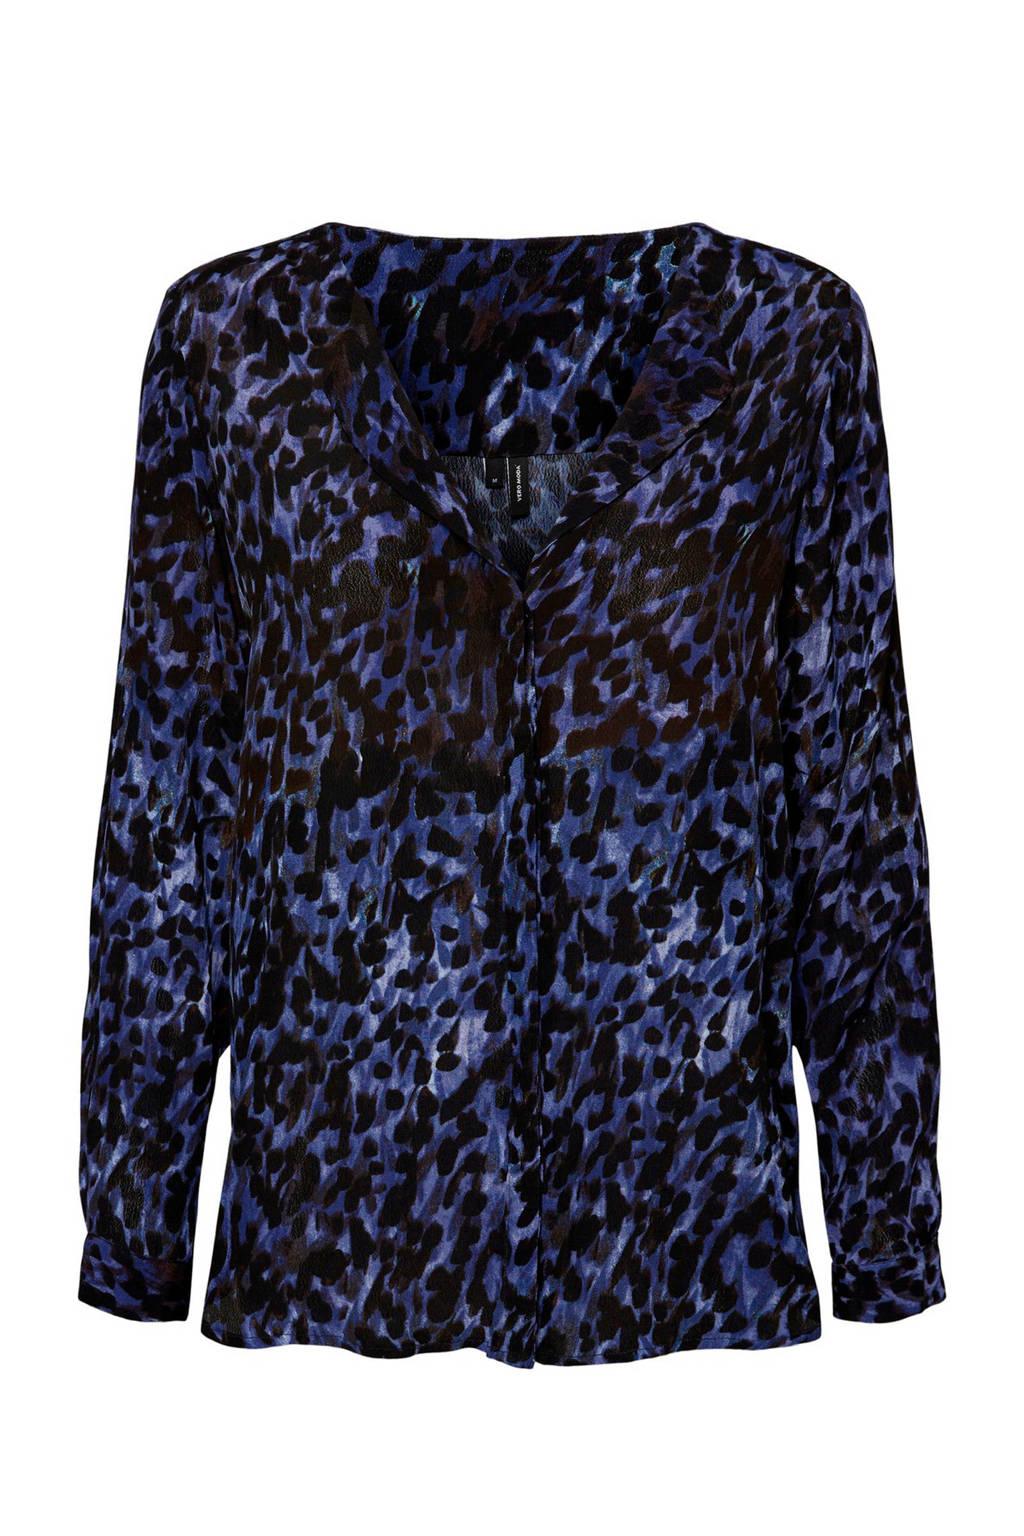 VERO MODA blouse blauw, Blauw